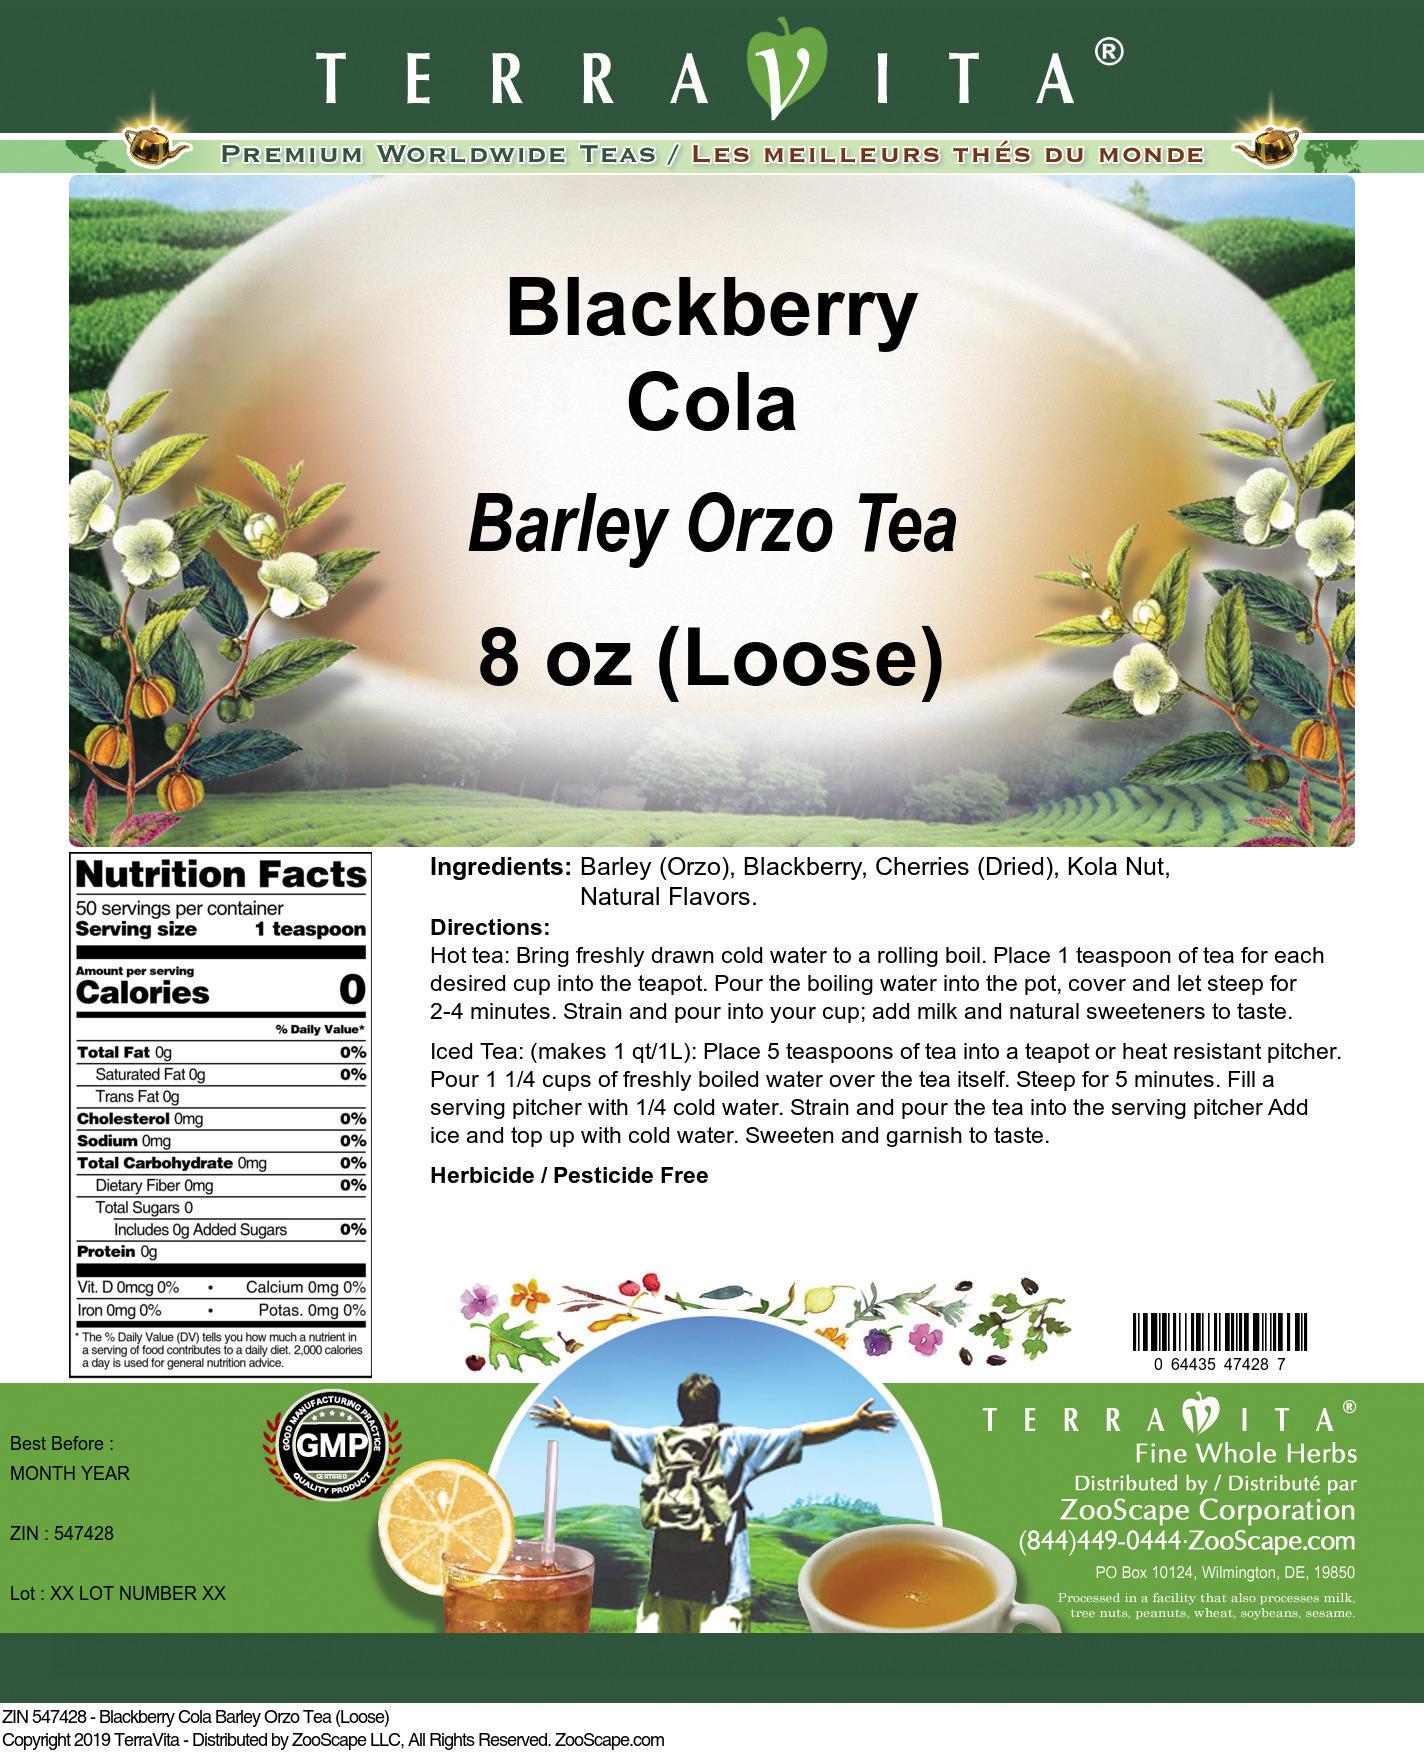 Blackberry Cola Barley Orzo